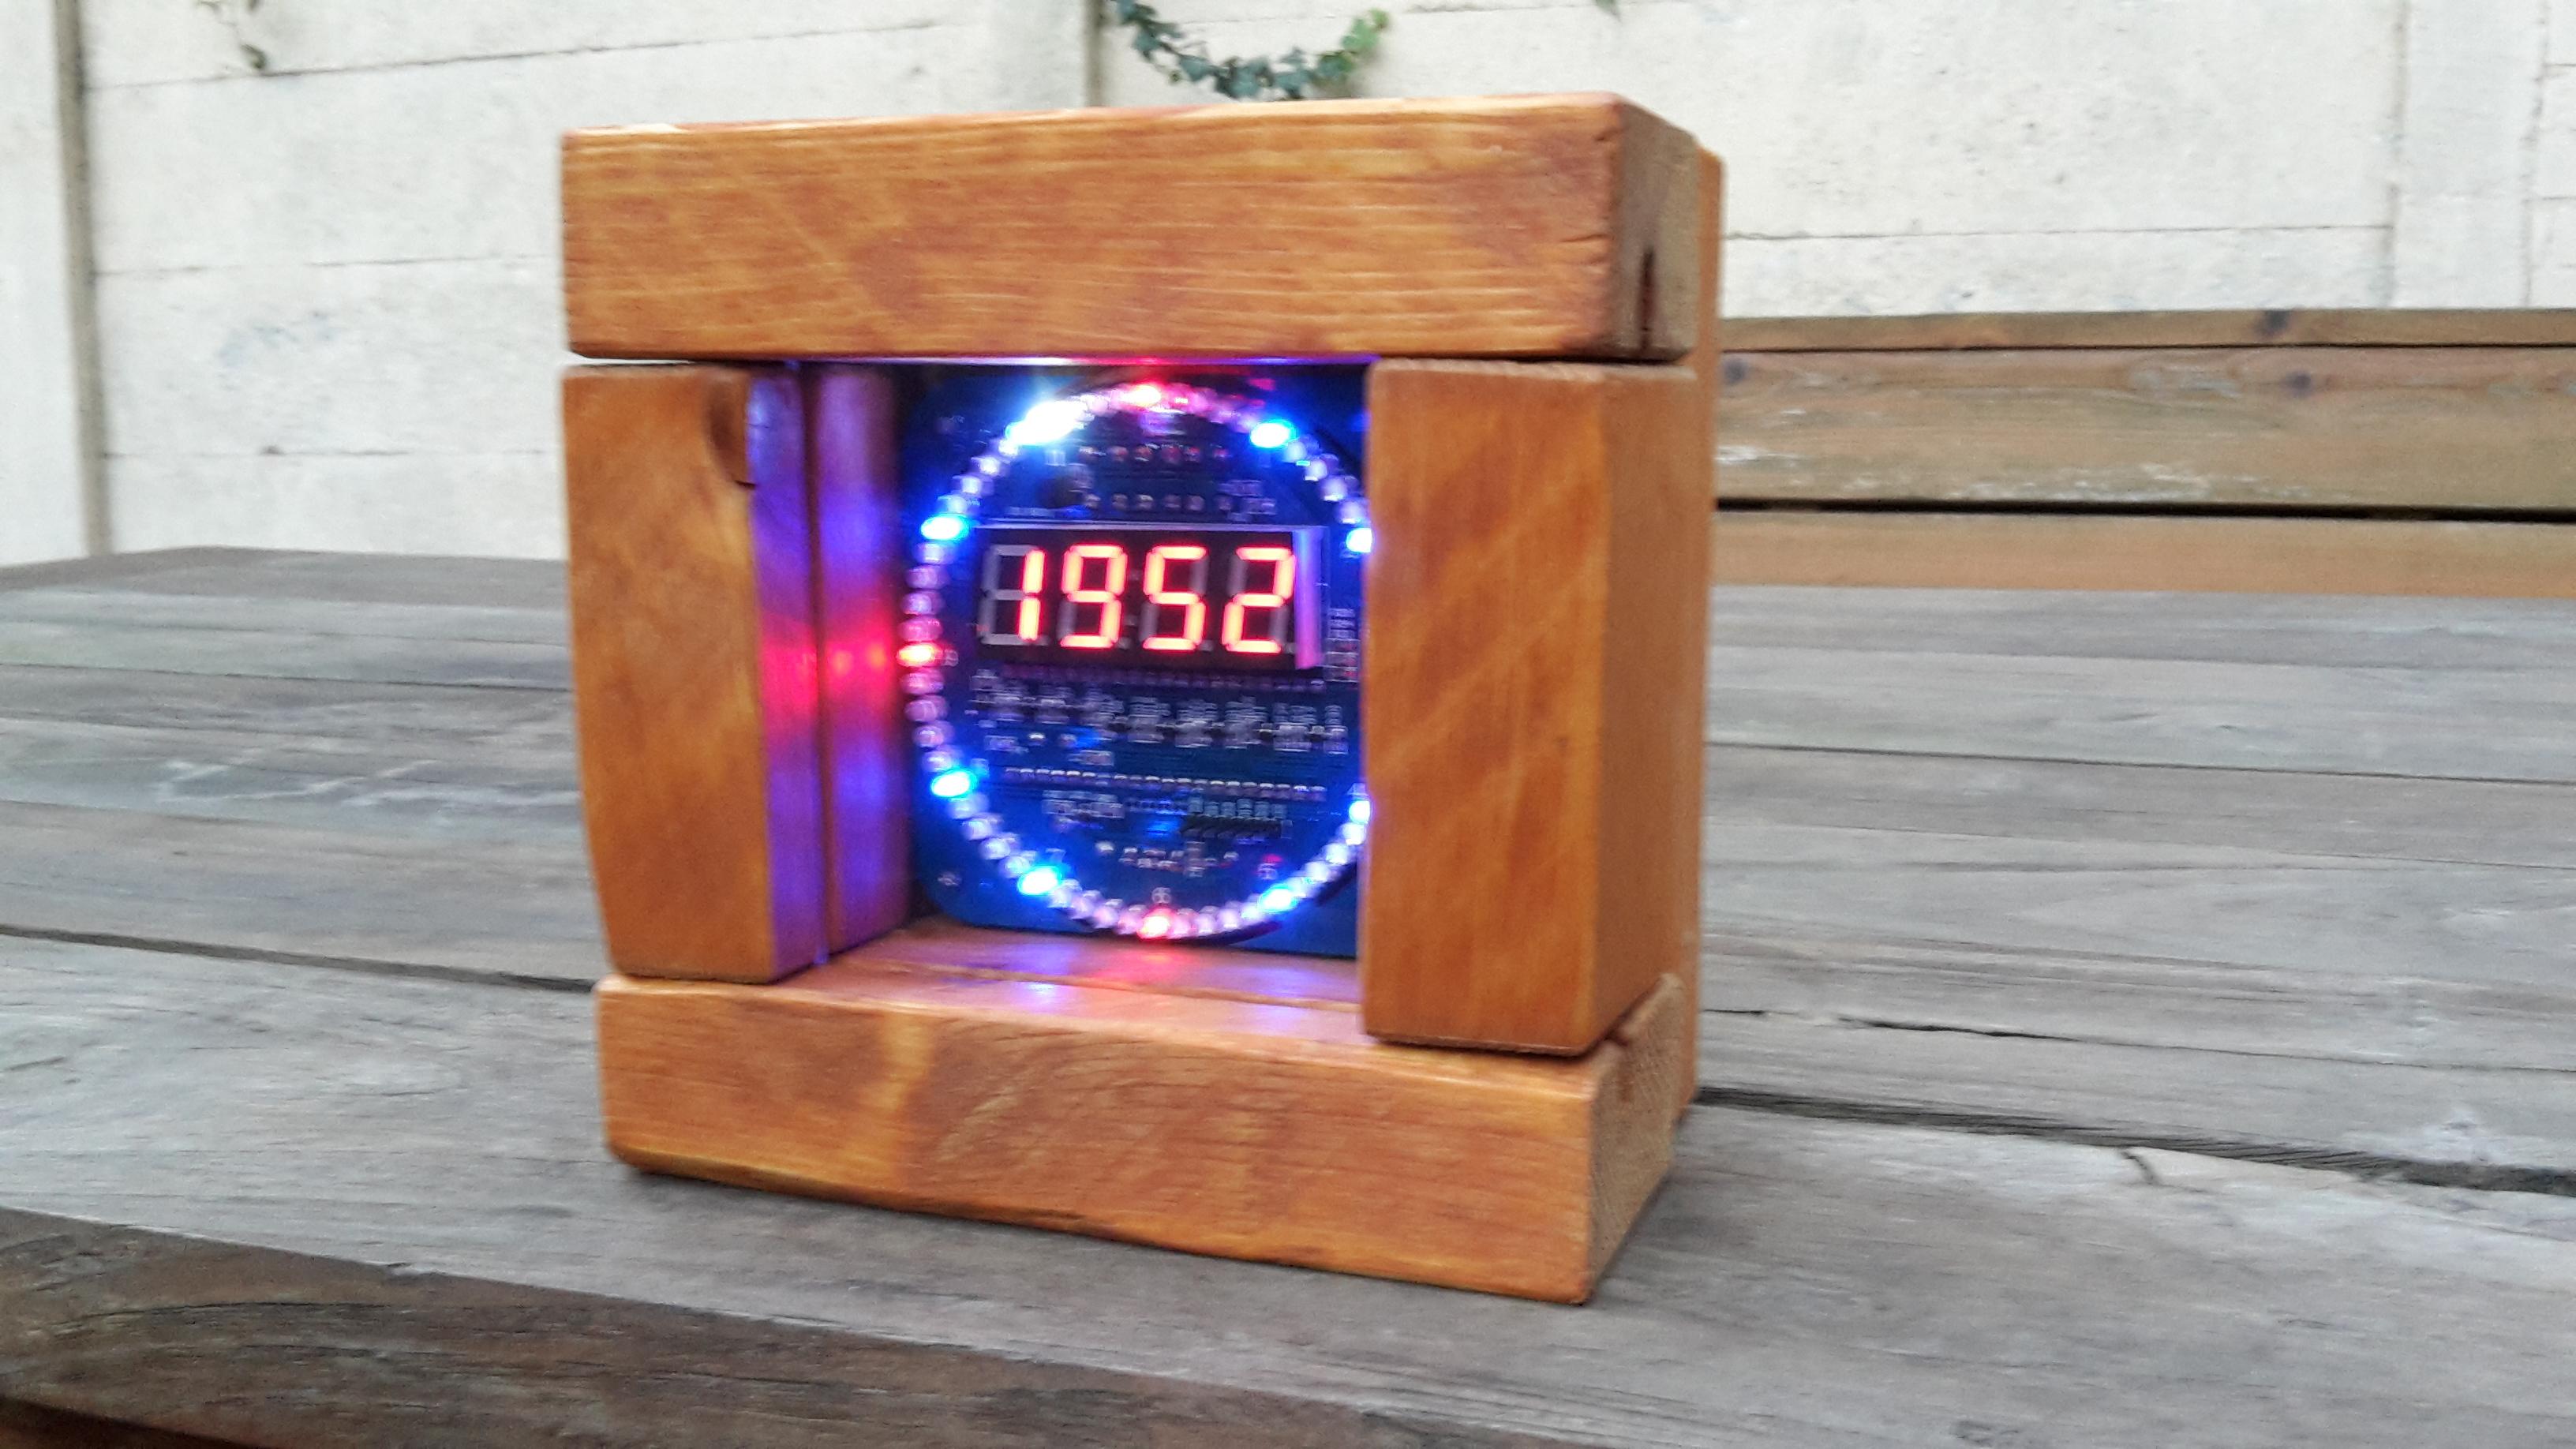 Picture of Custom Wooden Case for DIY Ebay DS1302 EC1204 V1.2 Rotating Clock